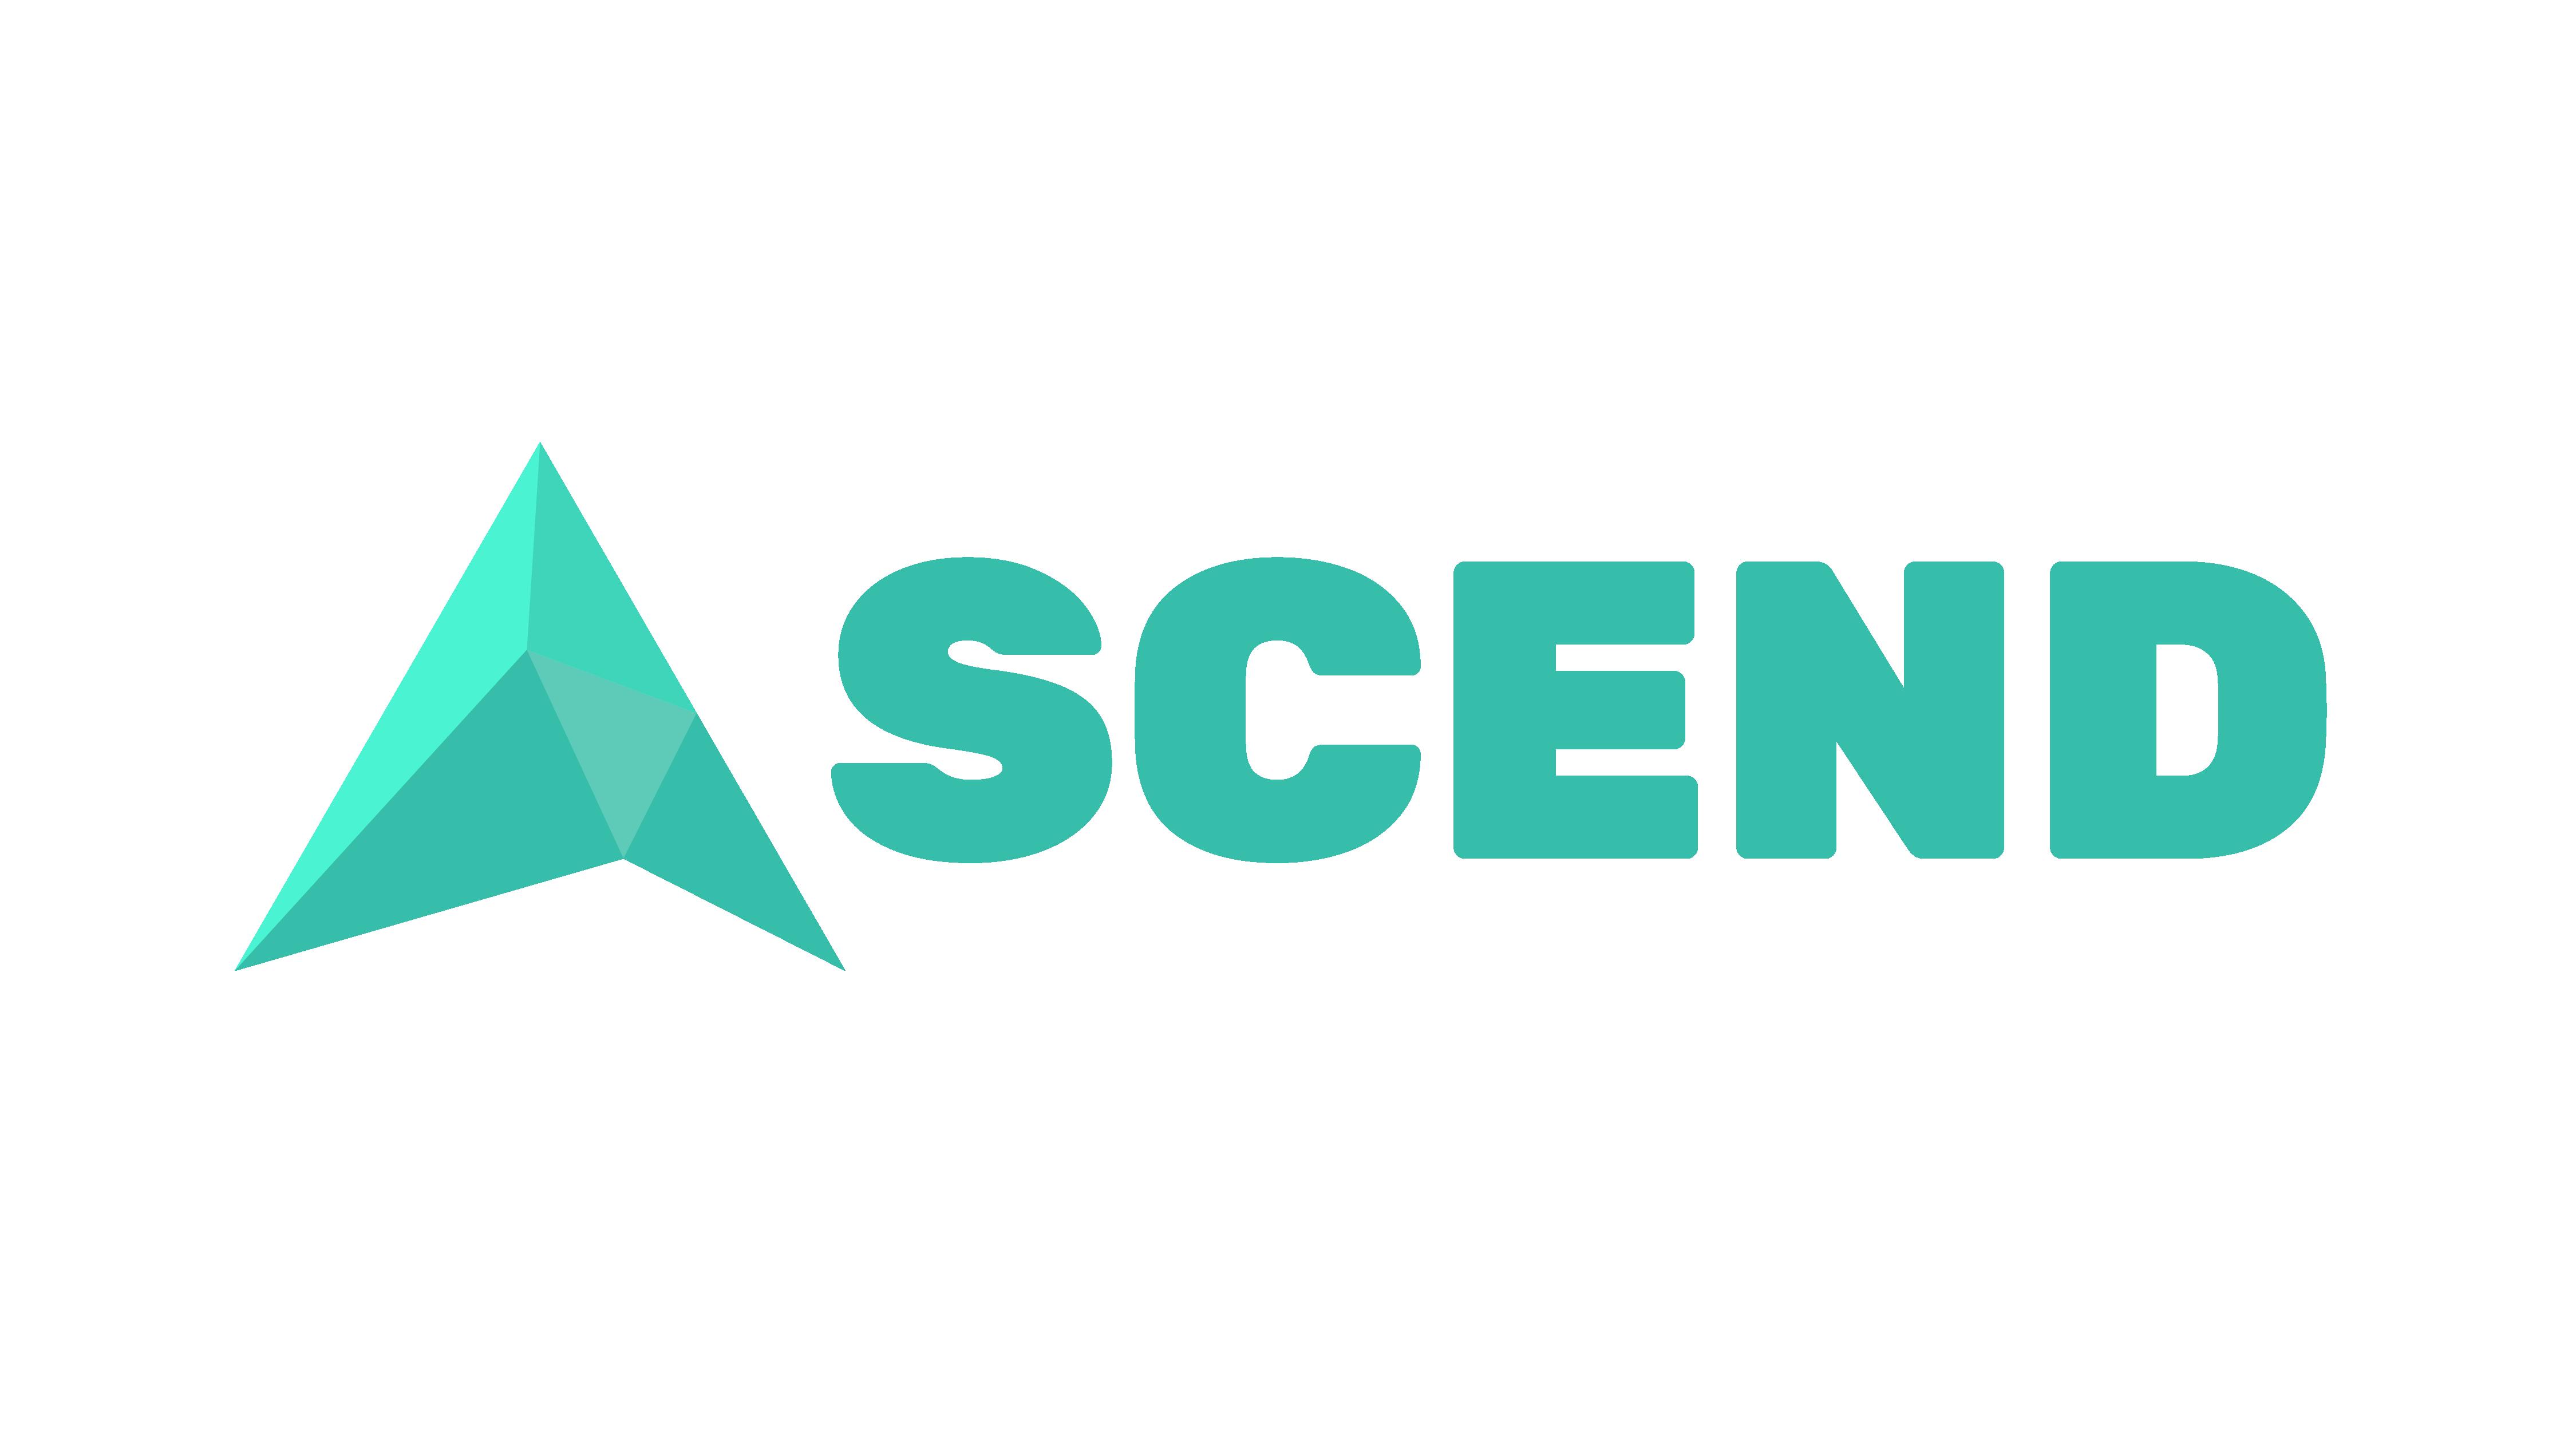 Ascend Digital Marketing